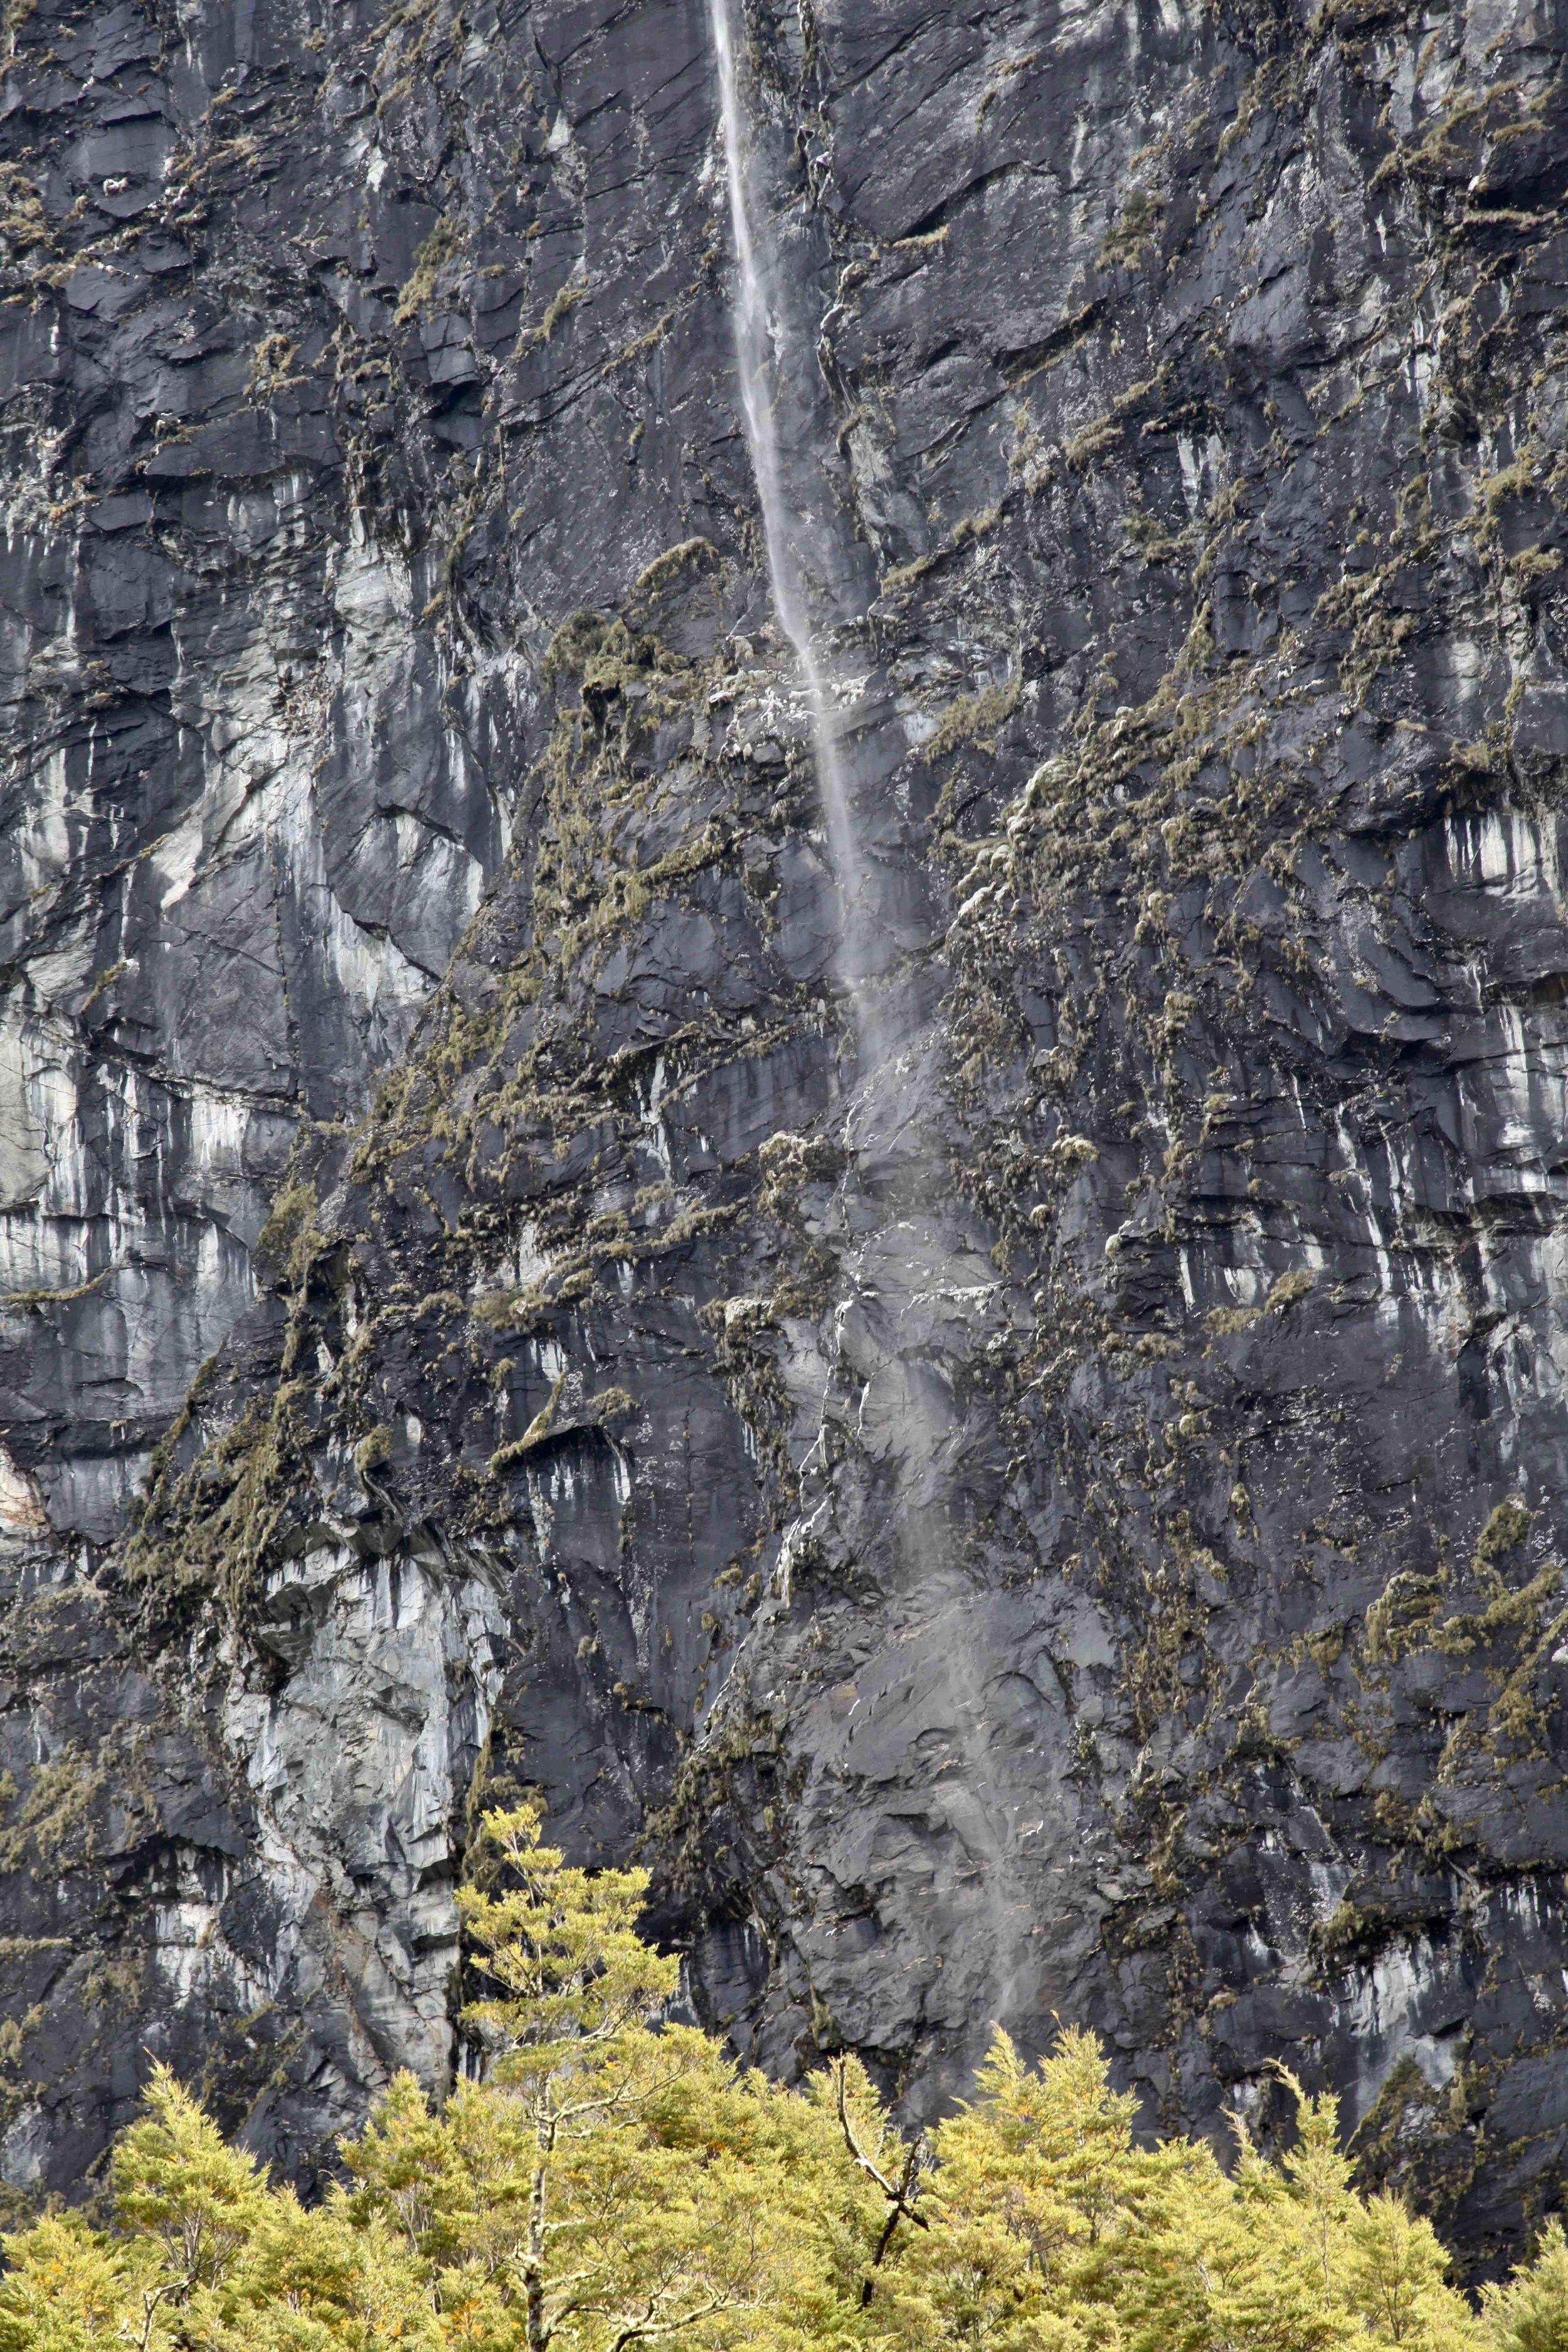 waterfall-mt-aspiring-national-park.jpg